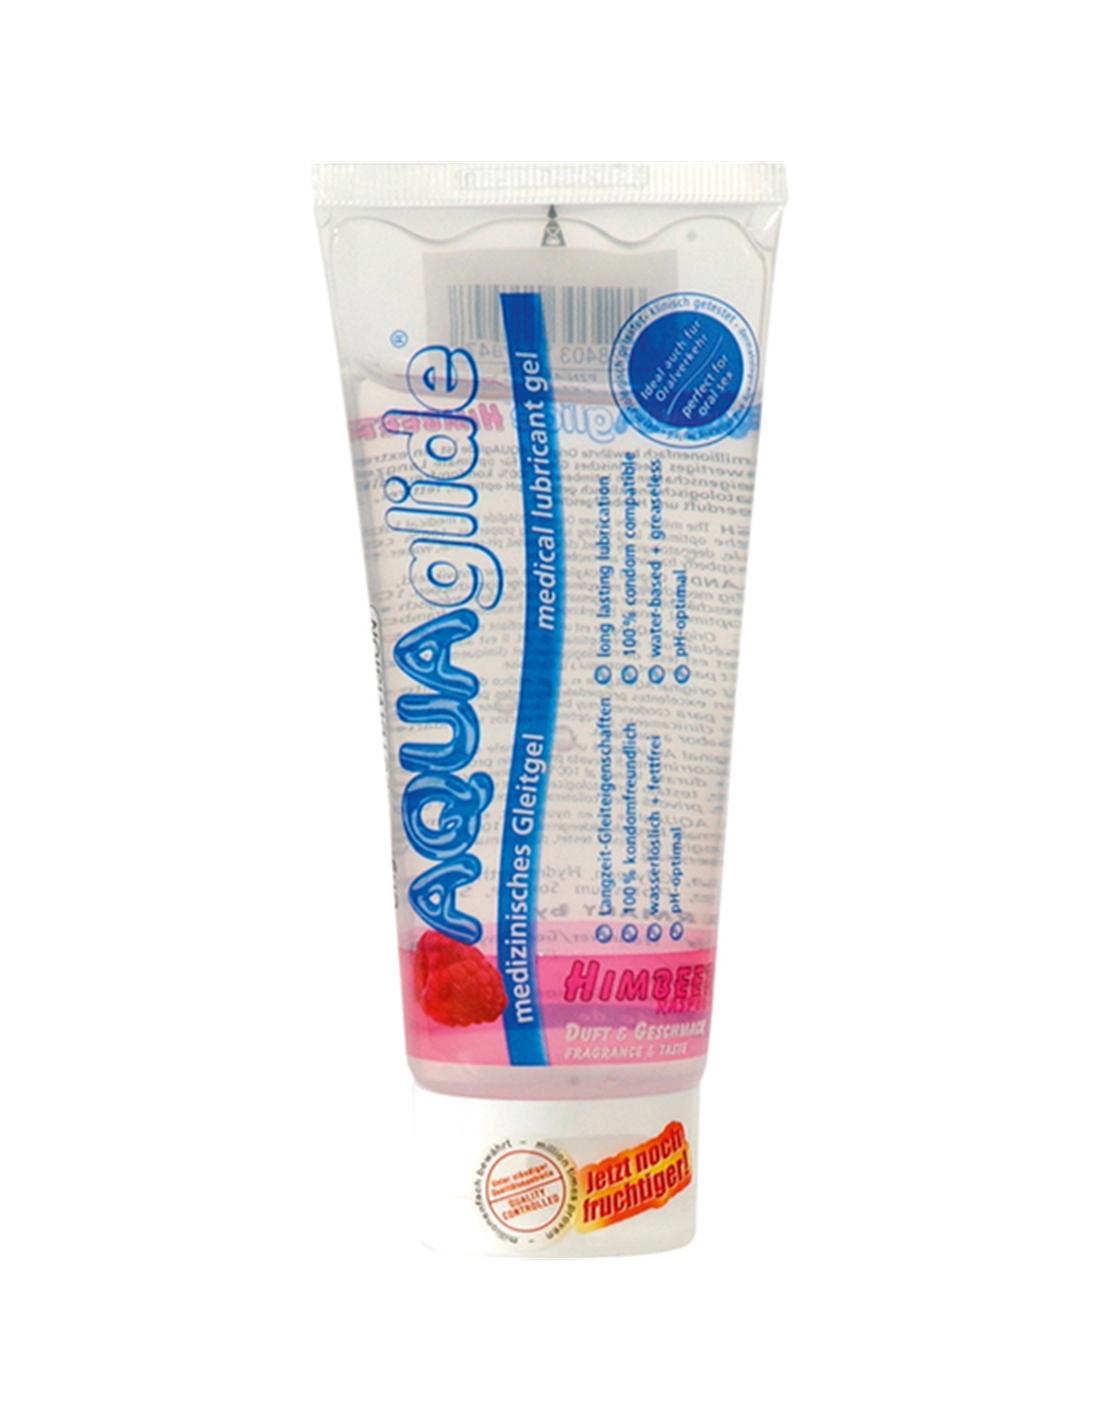 Lubrificante Aquaglide Framboesa - 100ml - DO29004933